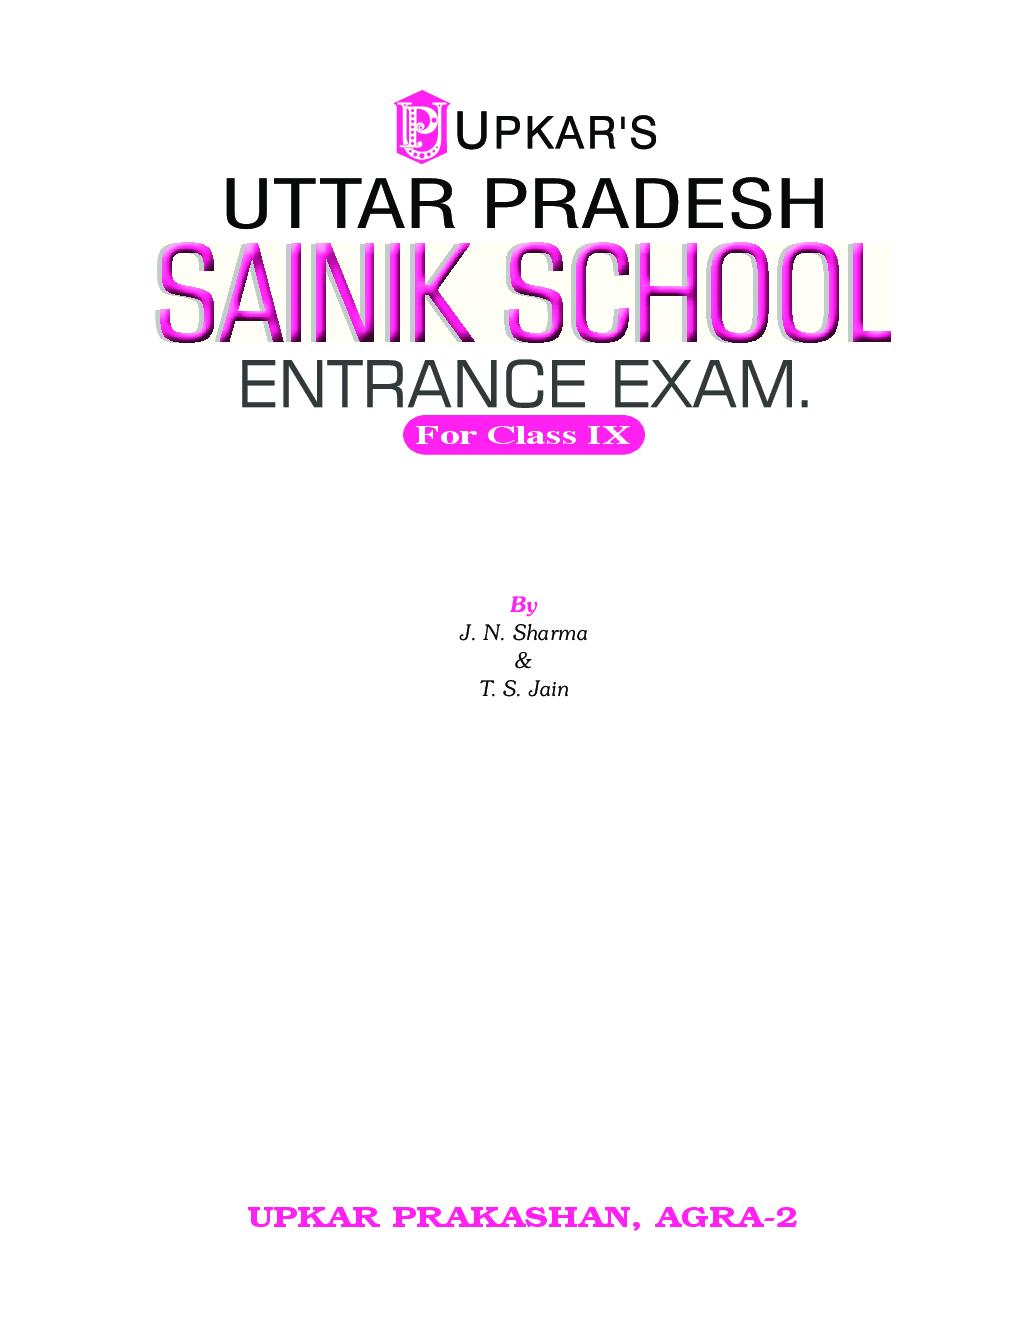 Uttar Pradesh Sainik School Entrance Exam For Class - IX - Page 2